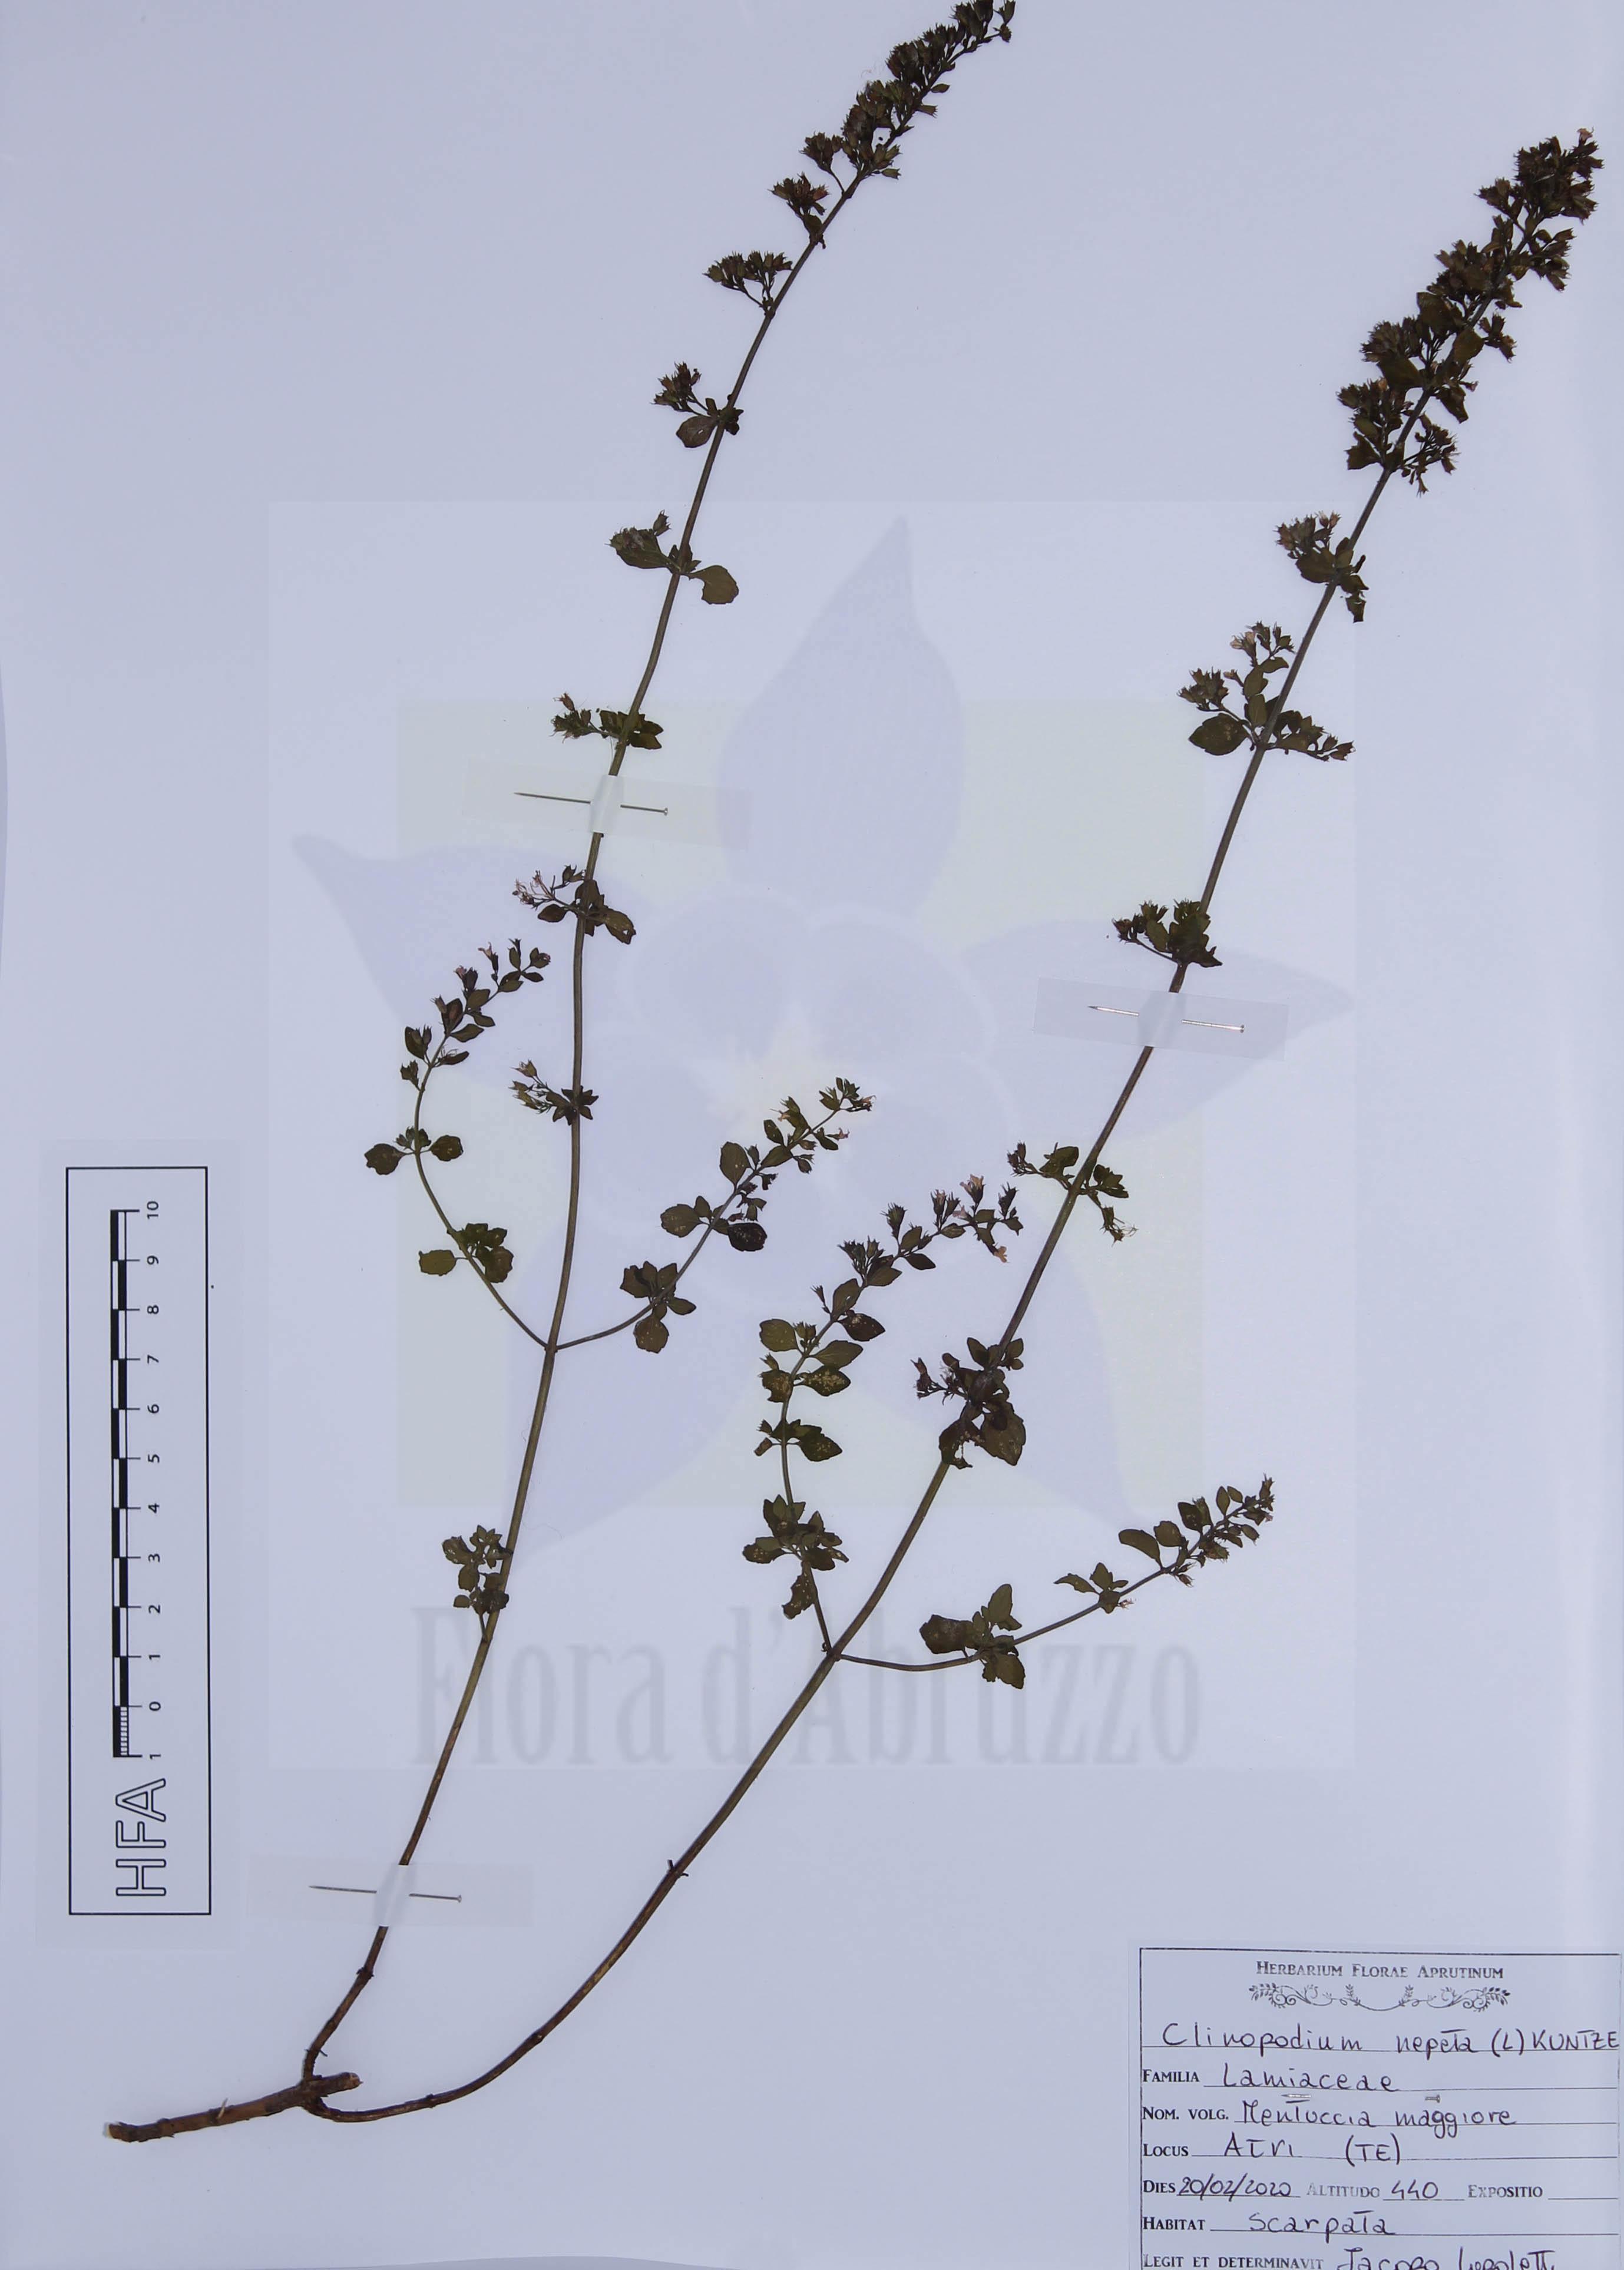 Clinopodium nepeta(L.) Kuntze